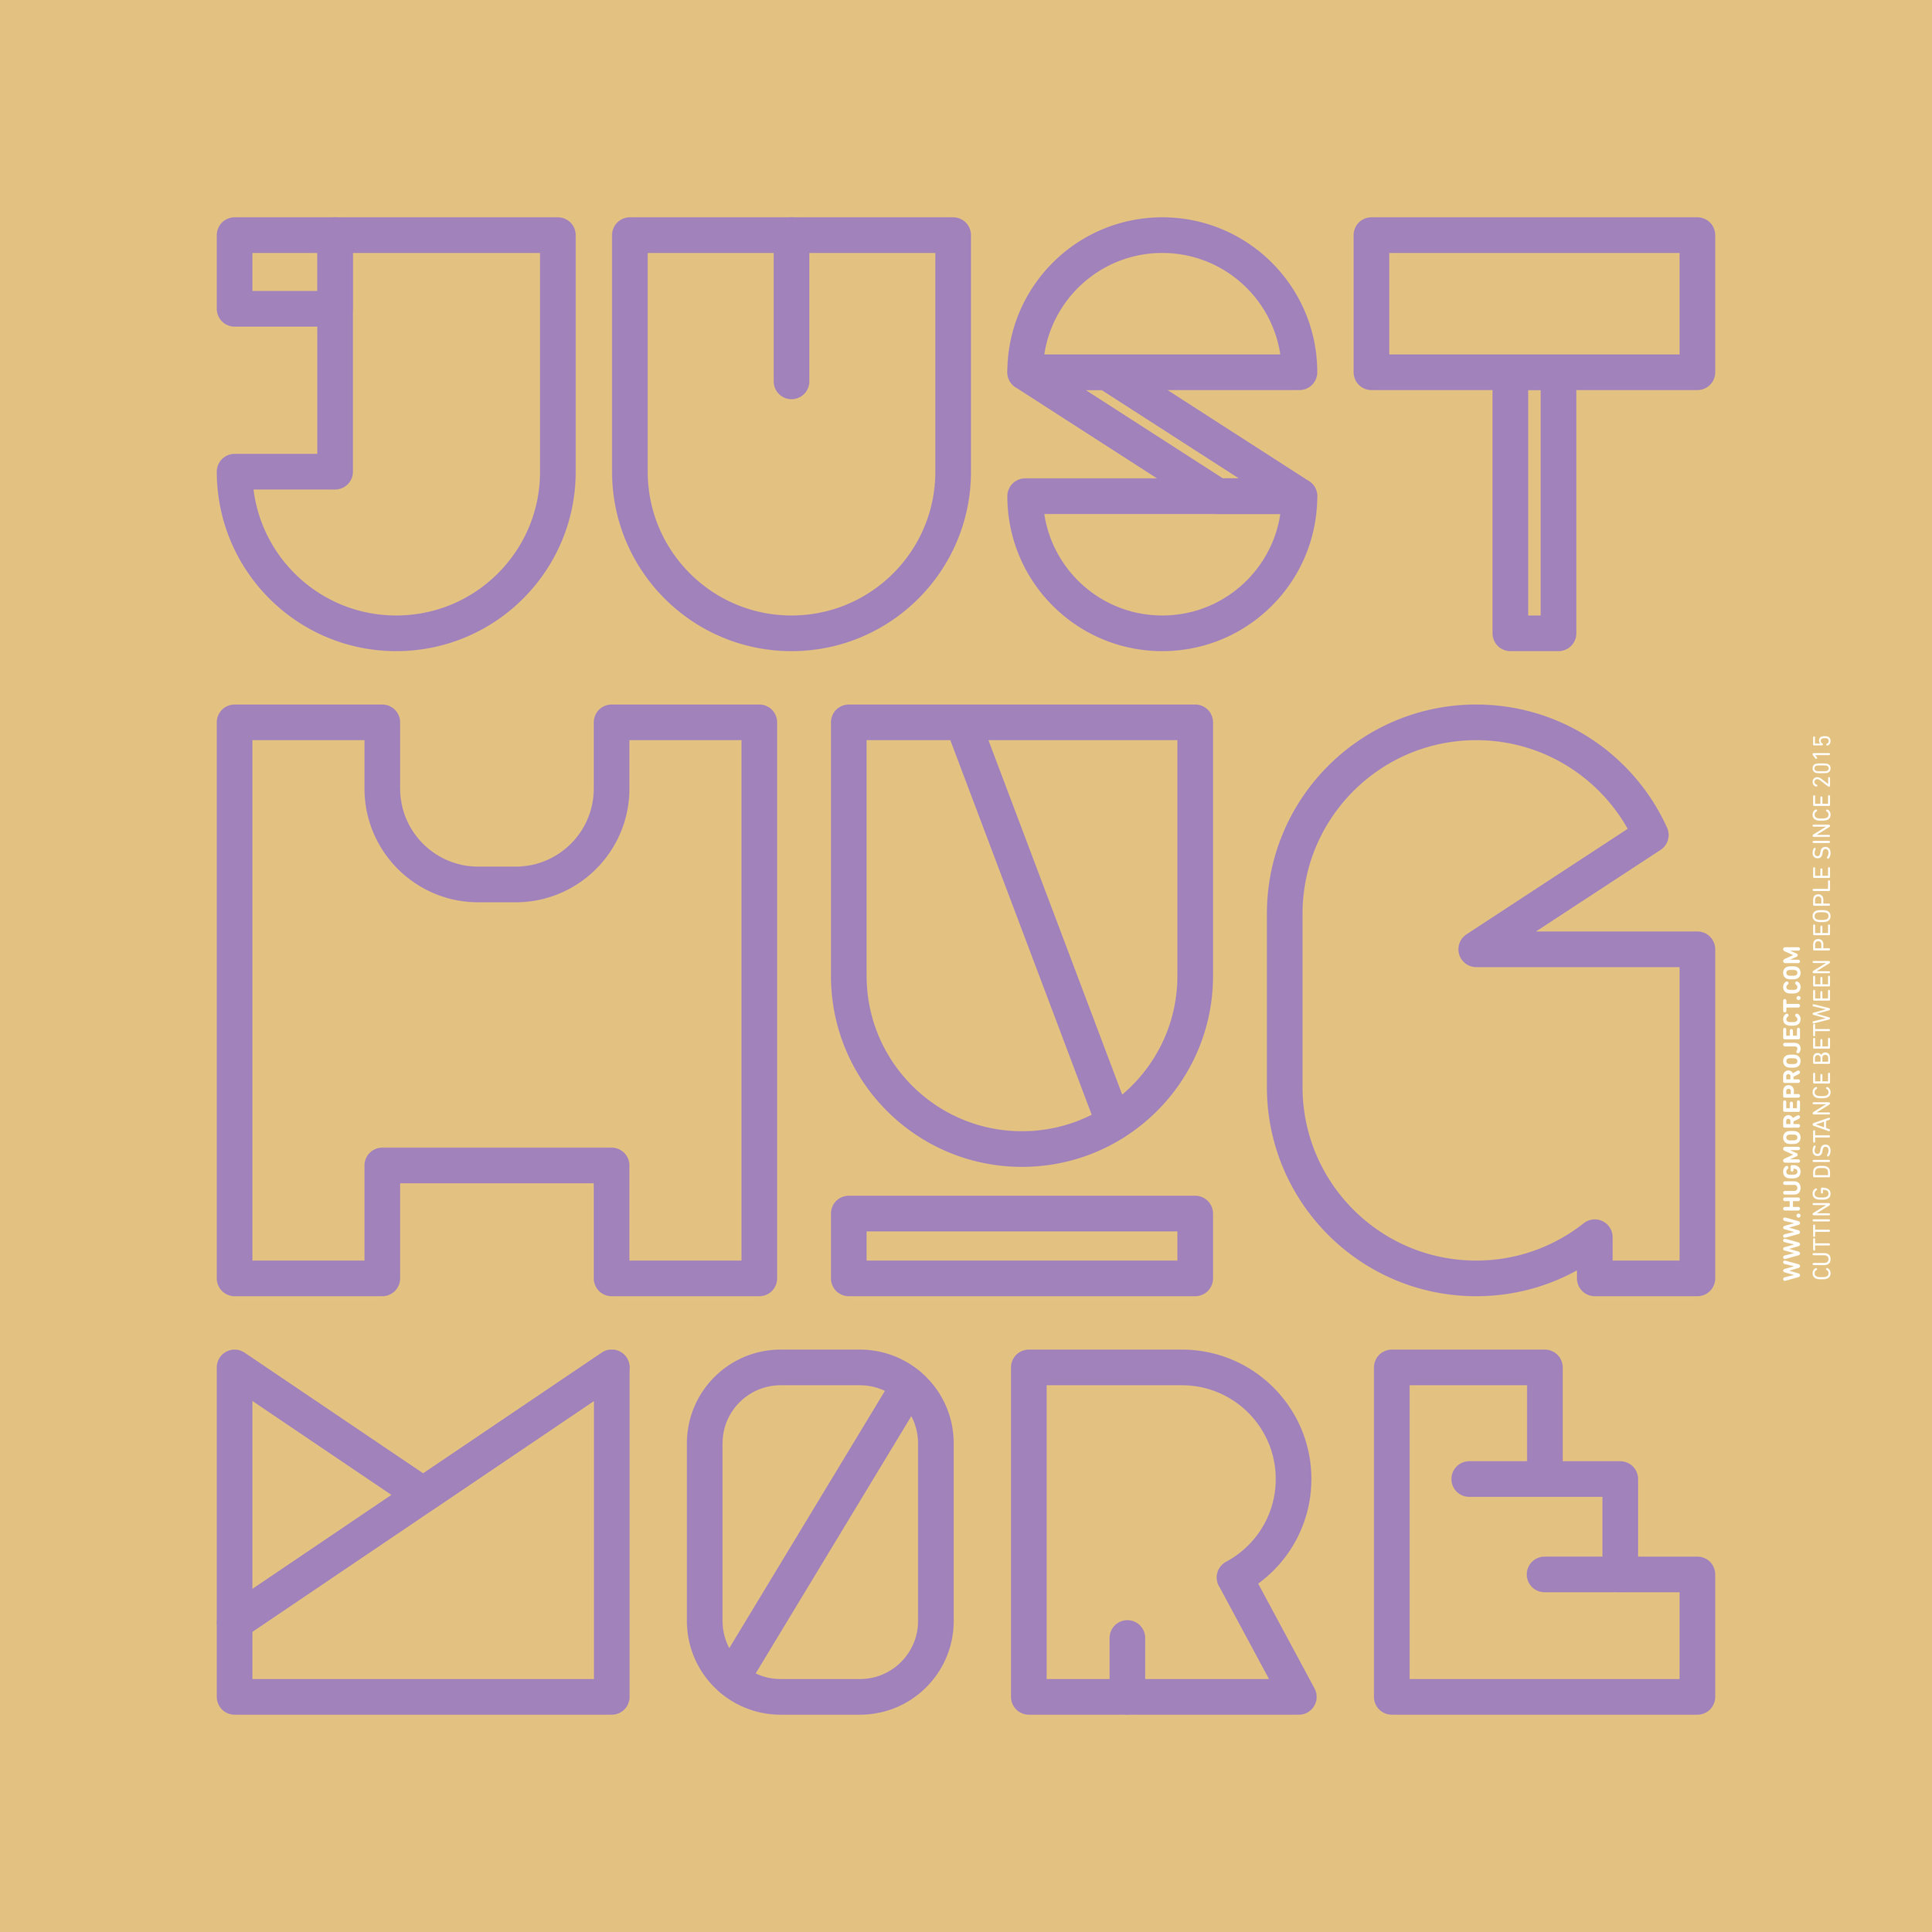 just-hug-more-typo-026.jpg